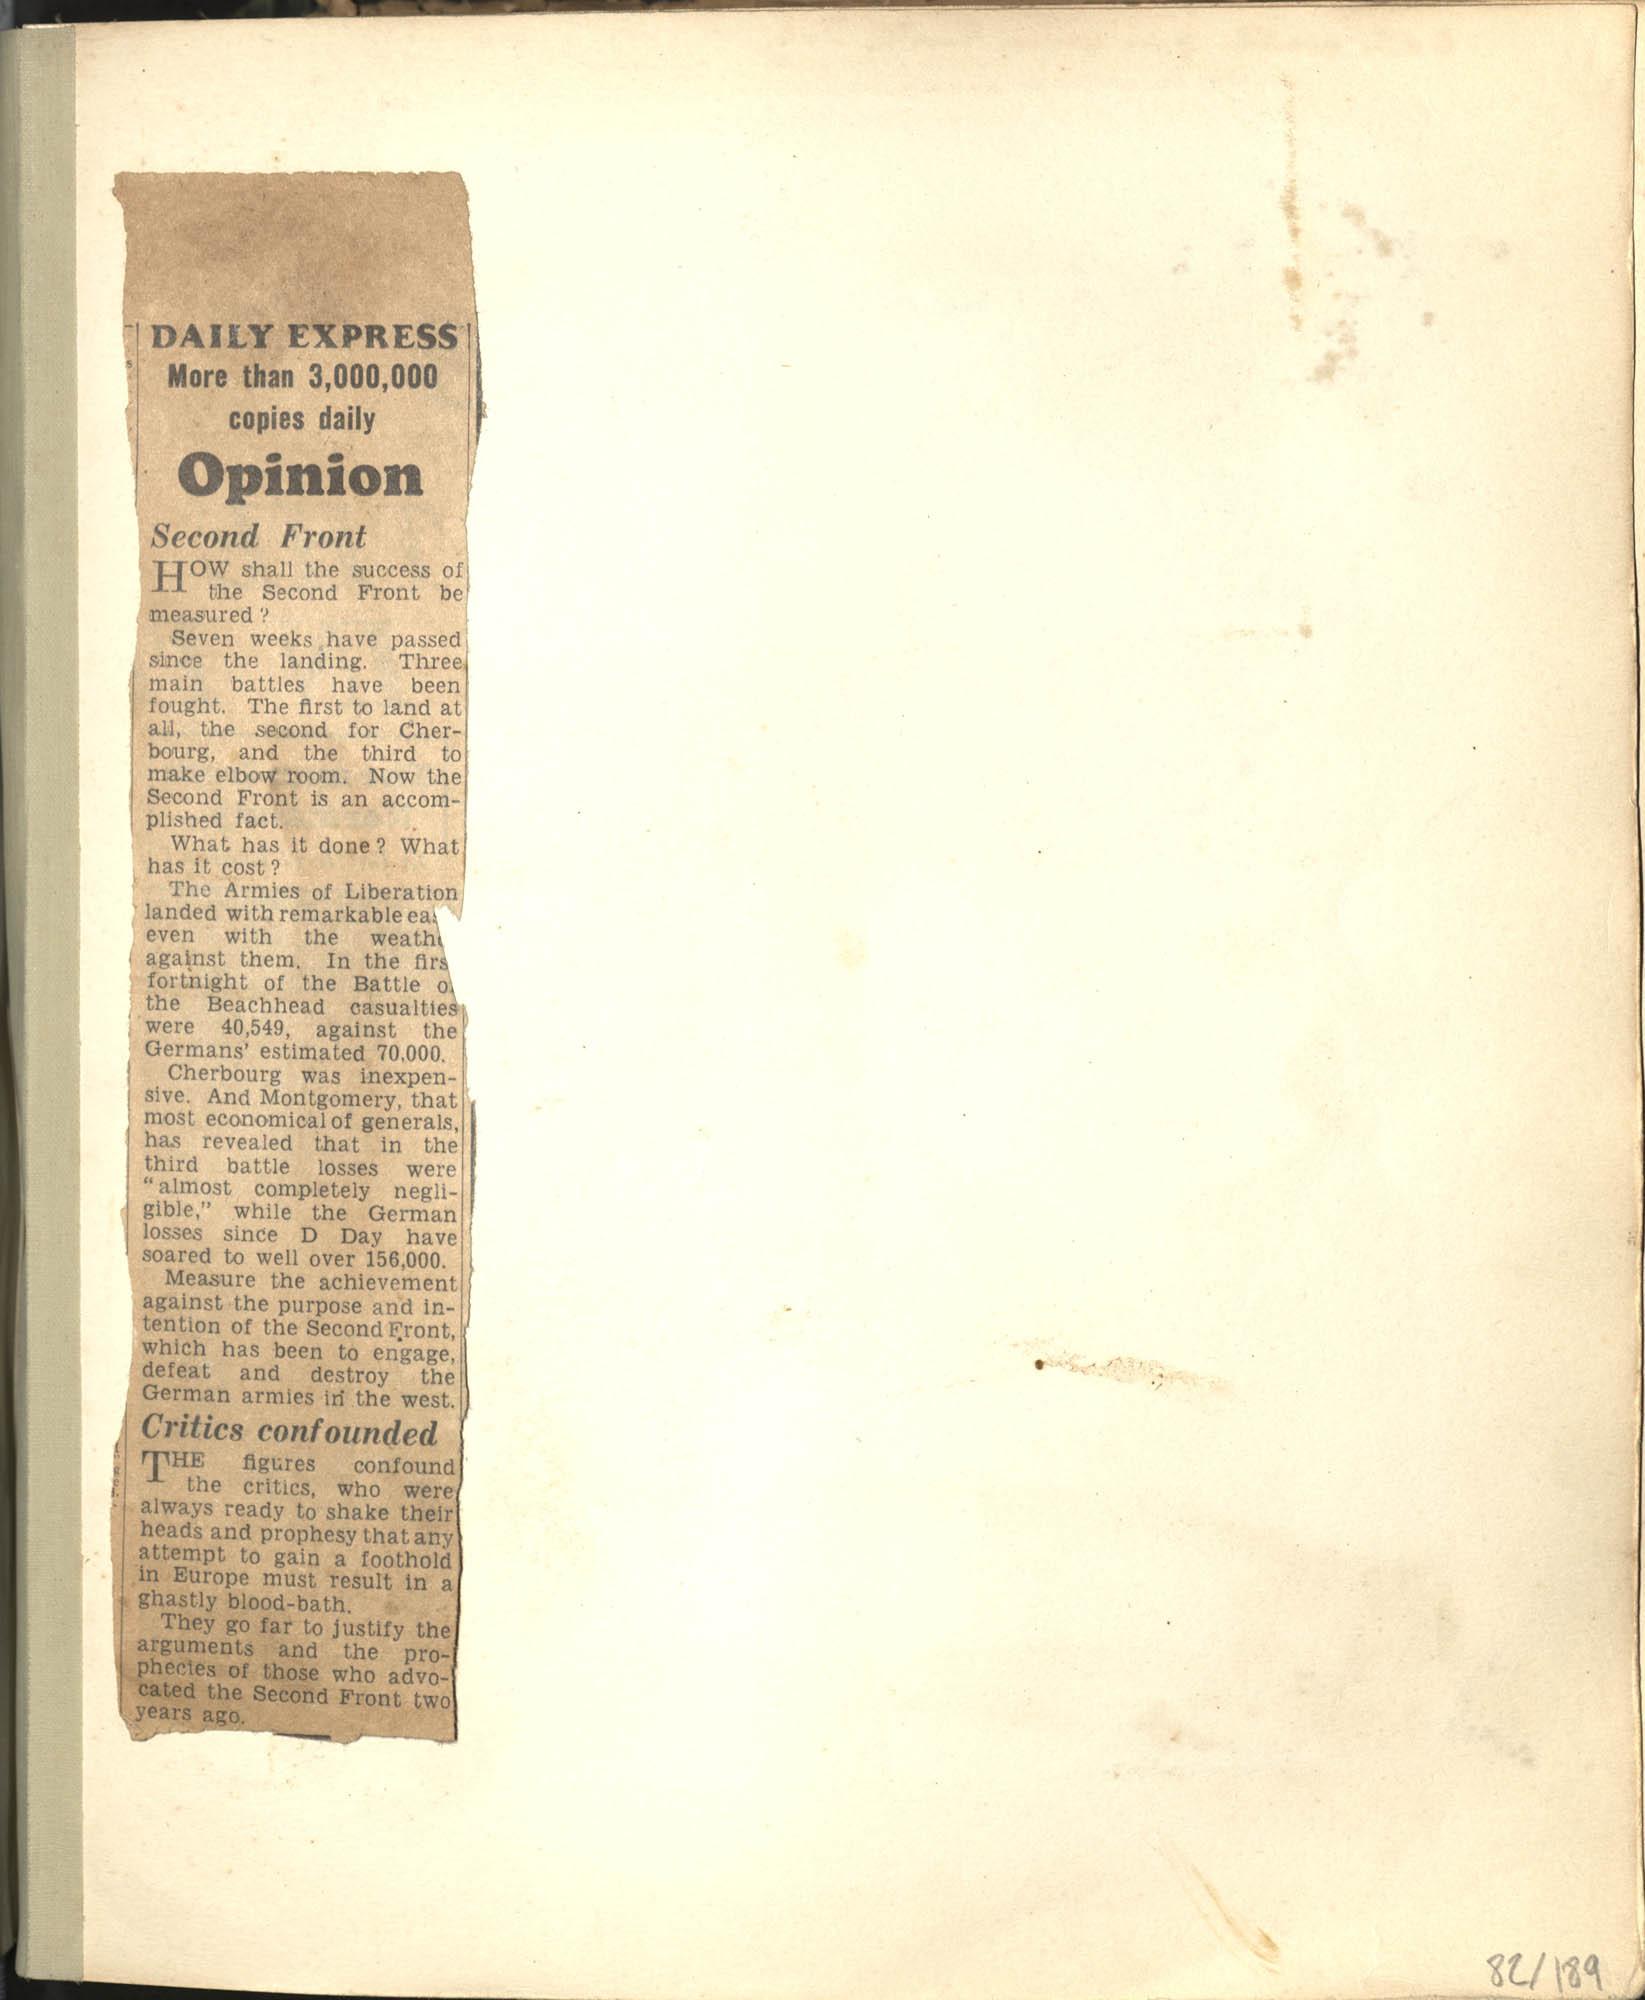 Gertrude Legendre OSS Scrapbook, 1944, Page 82